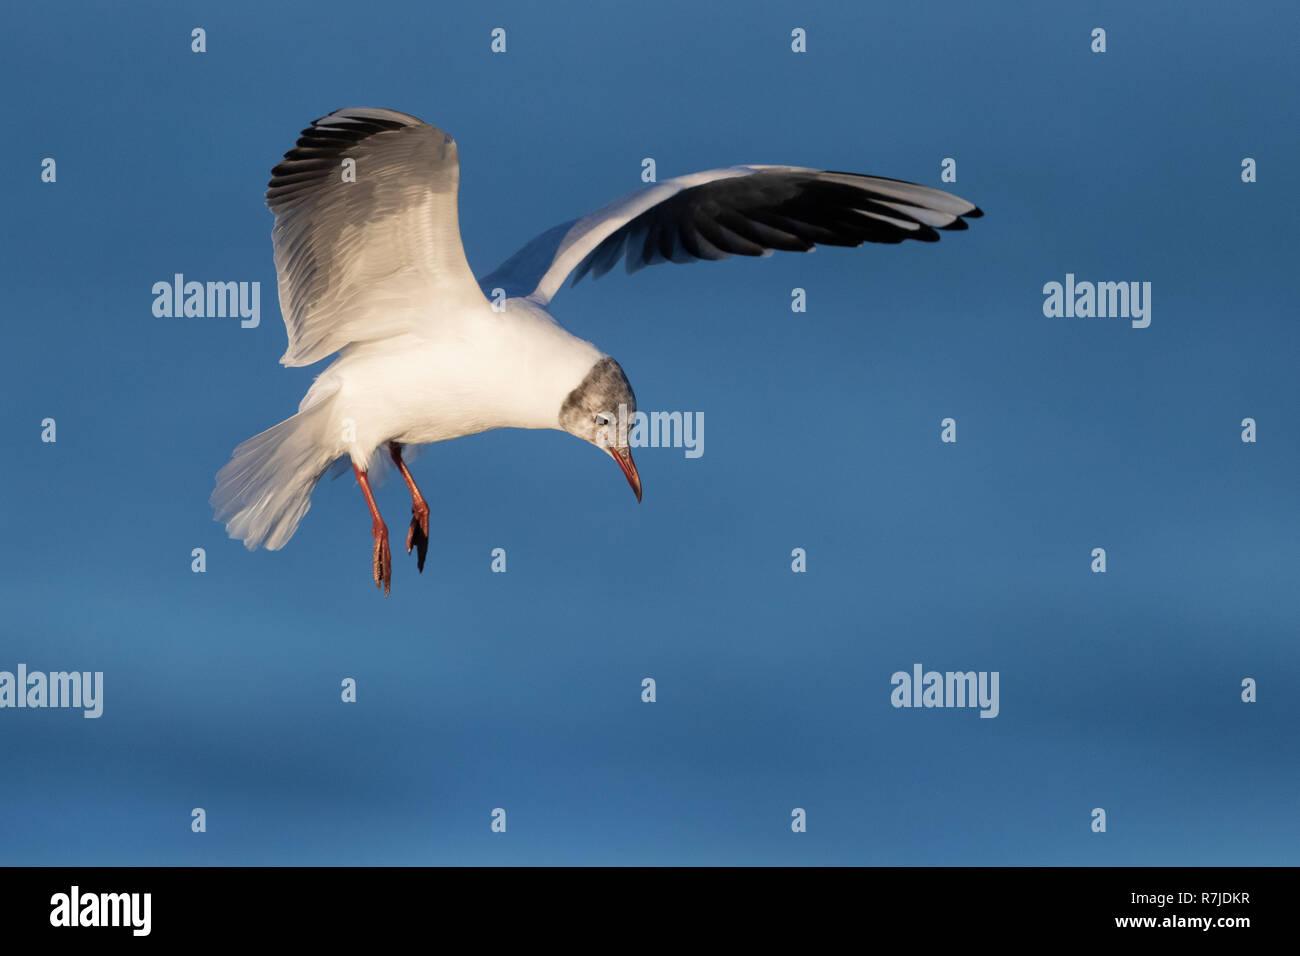 Black-headed Gull (Chroicocephalus ridibundus), adult moulting to summer plumage in flight Stock Photo